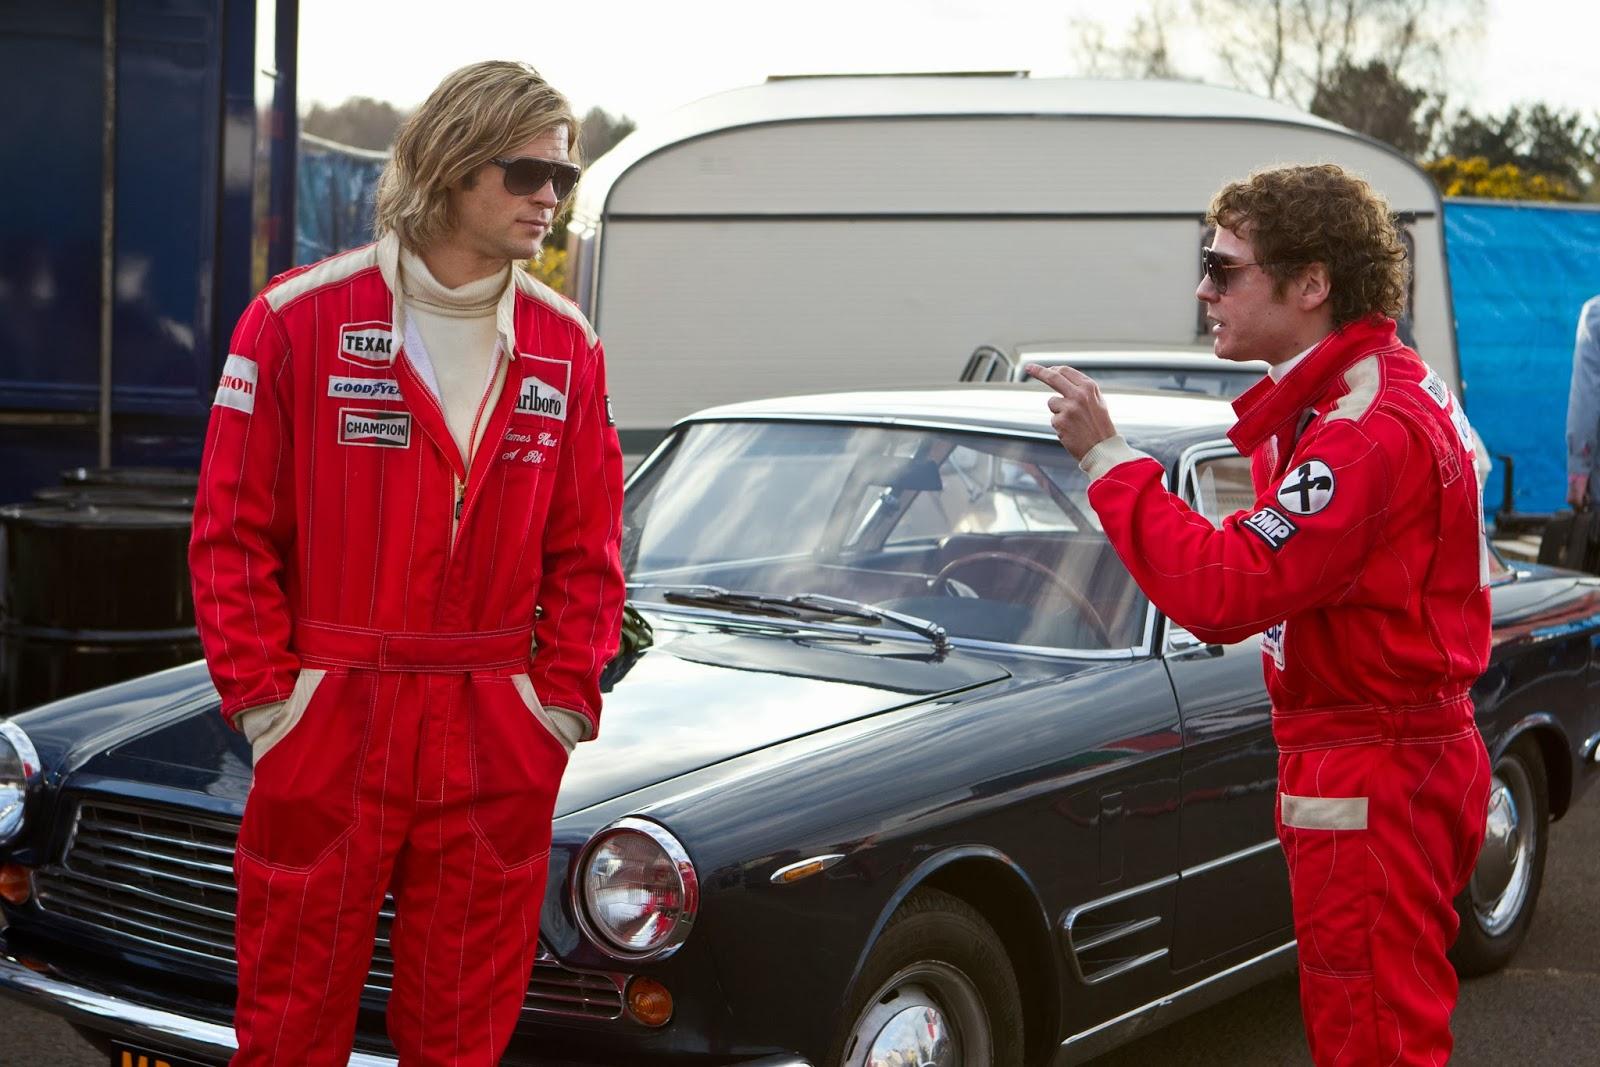 Race Car Movie With Chris Hemsworth